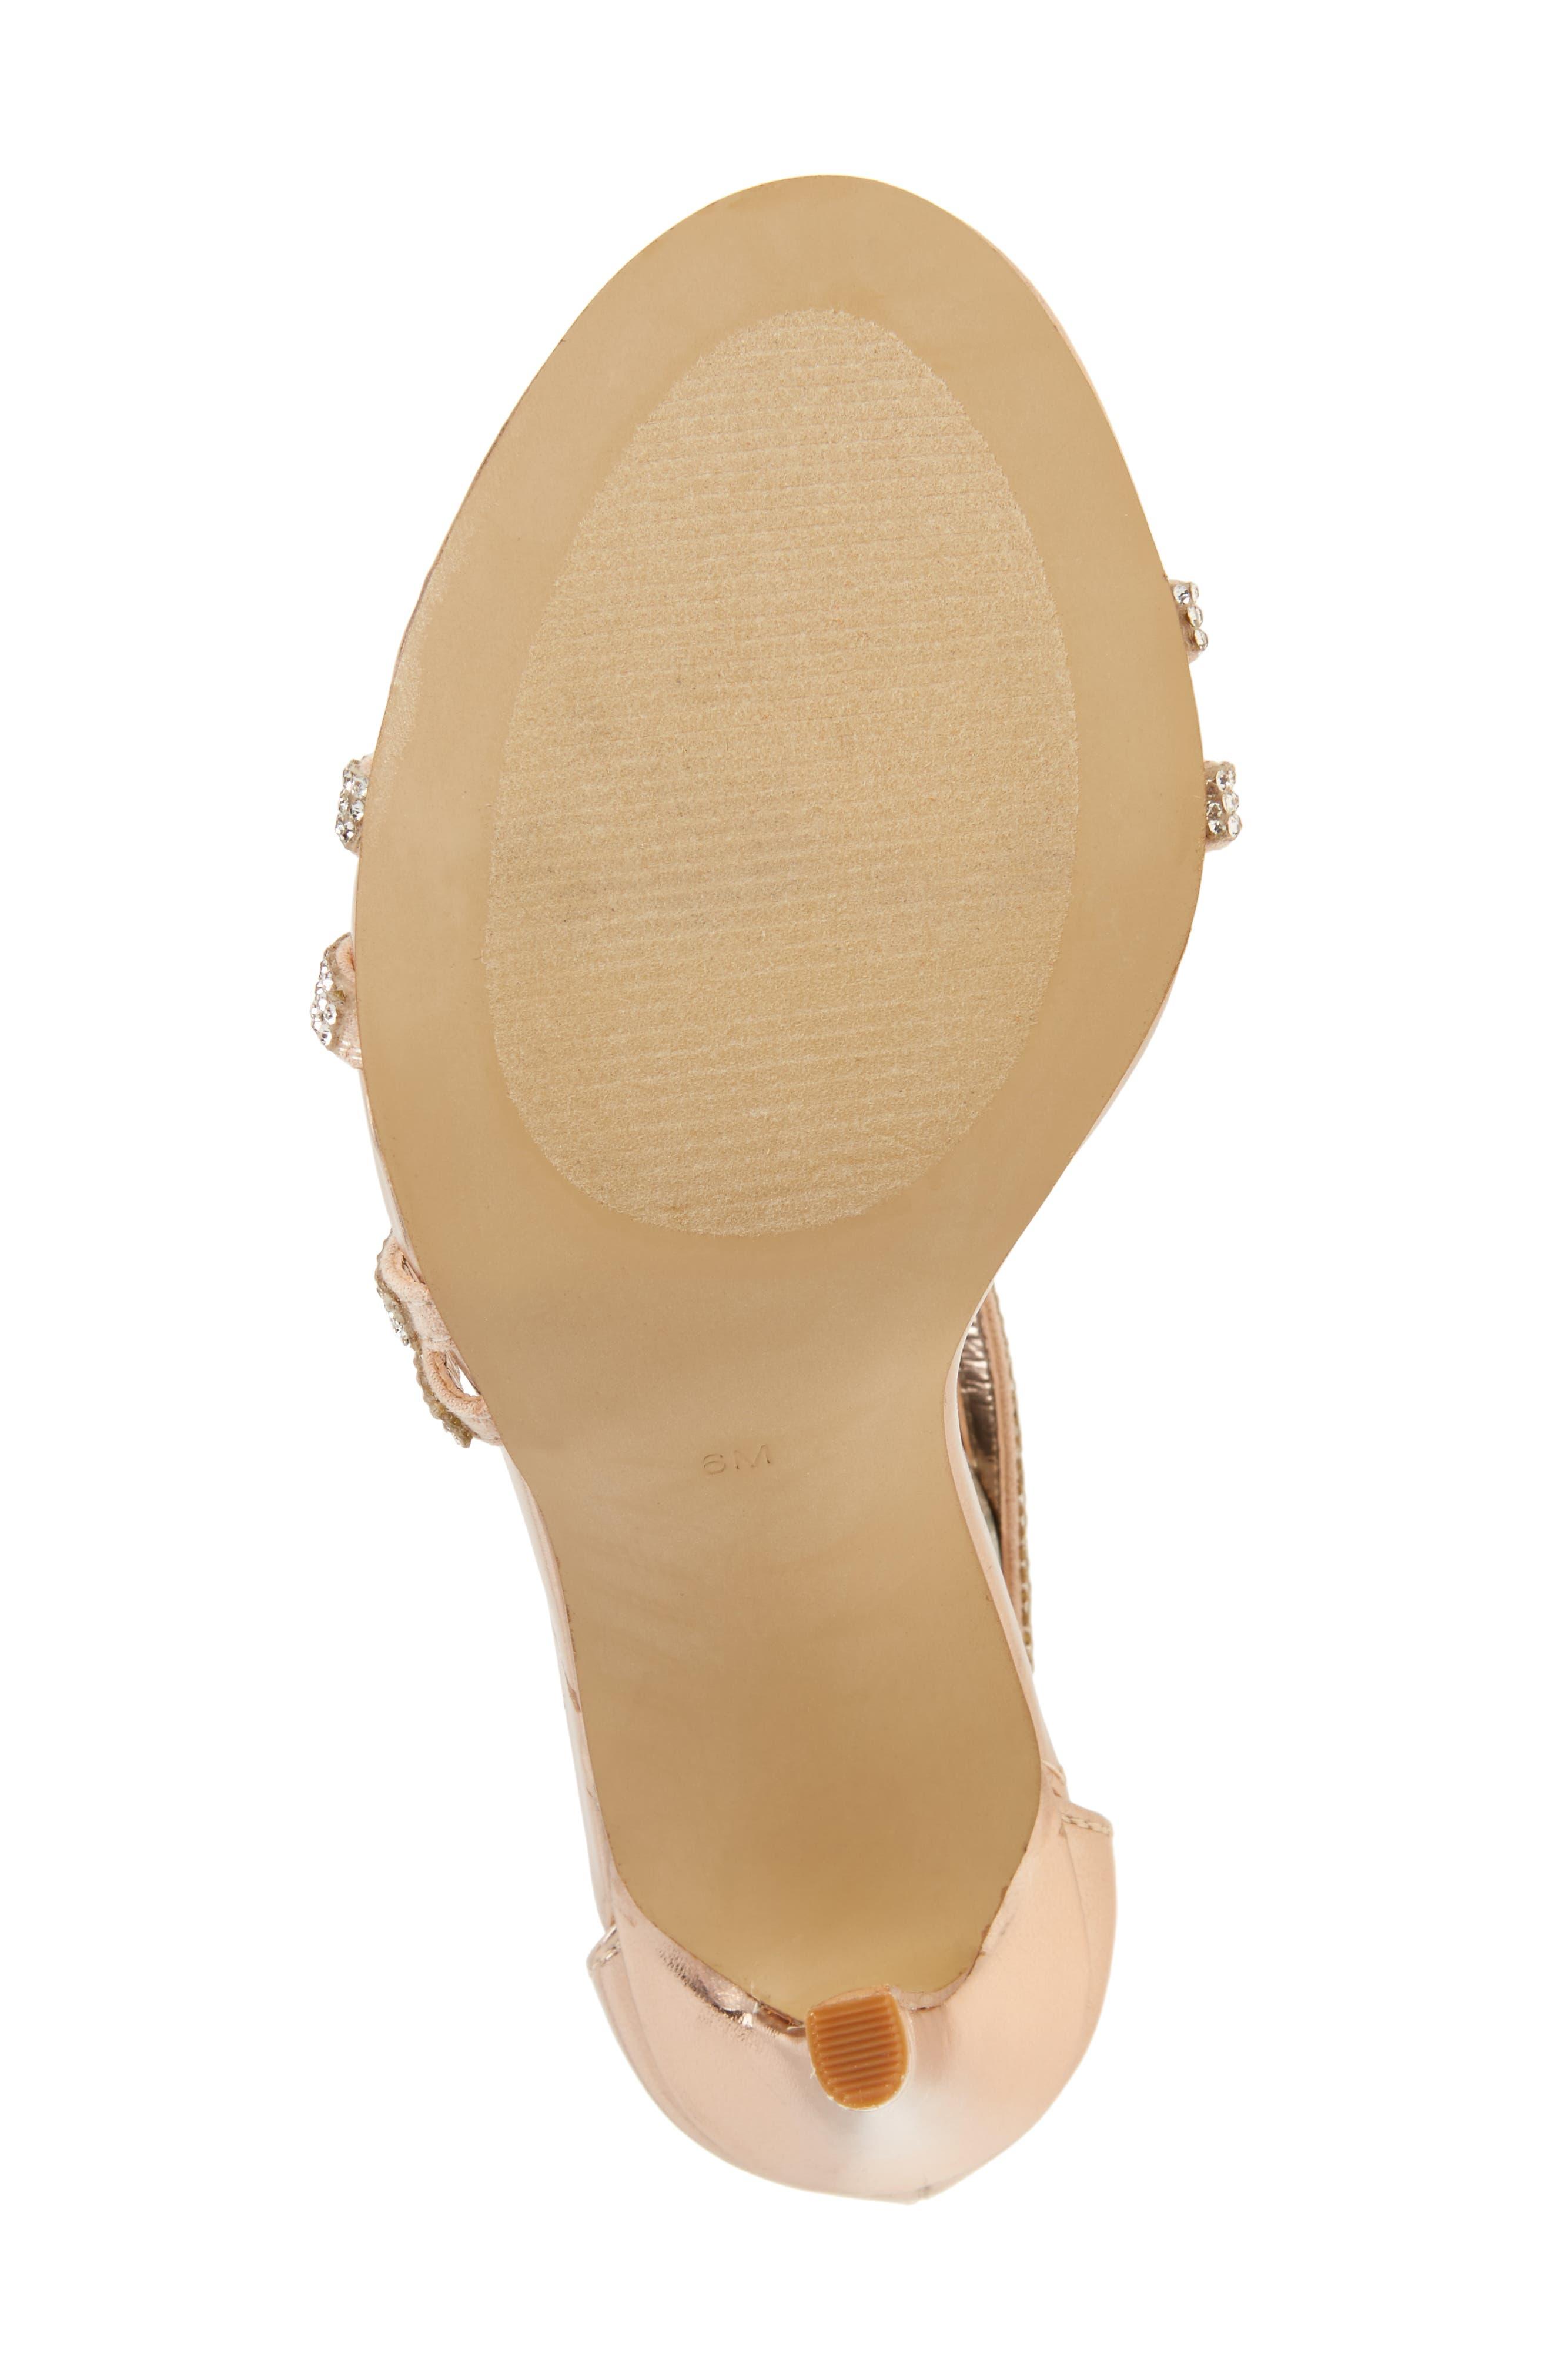 Sweetest Embellished Sandal,                             Alternate thumbnail 6, color,                             710